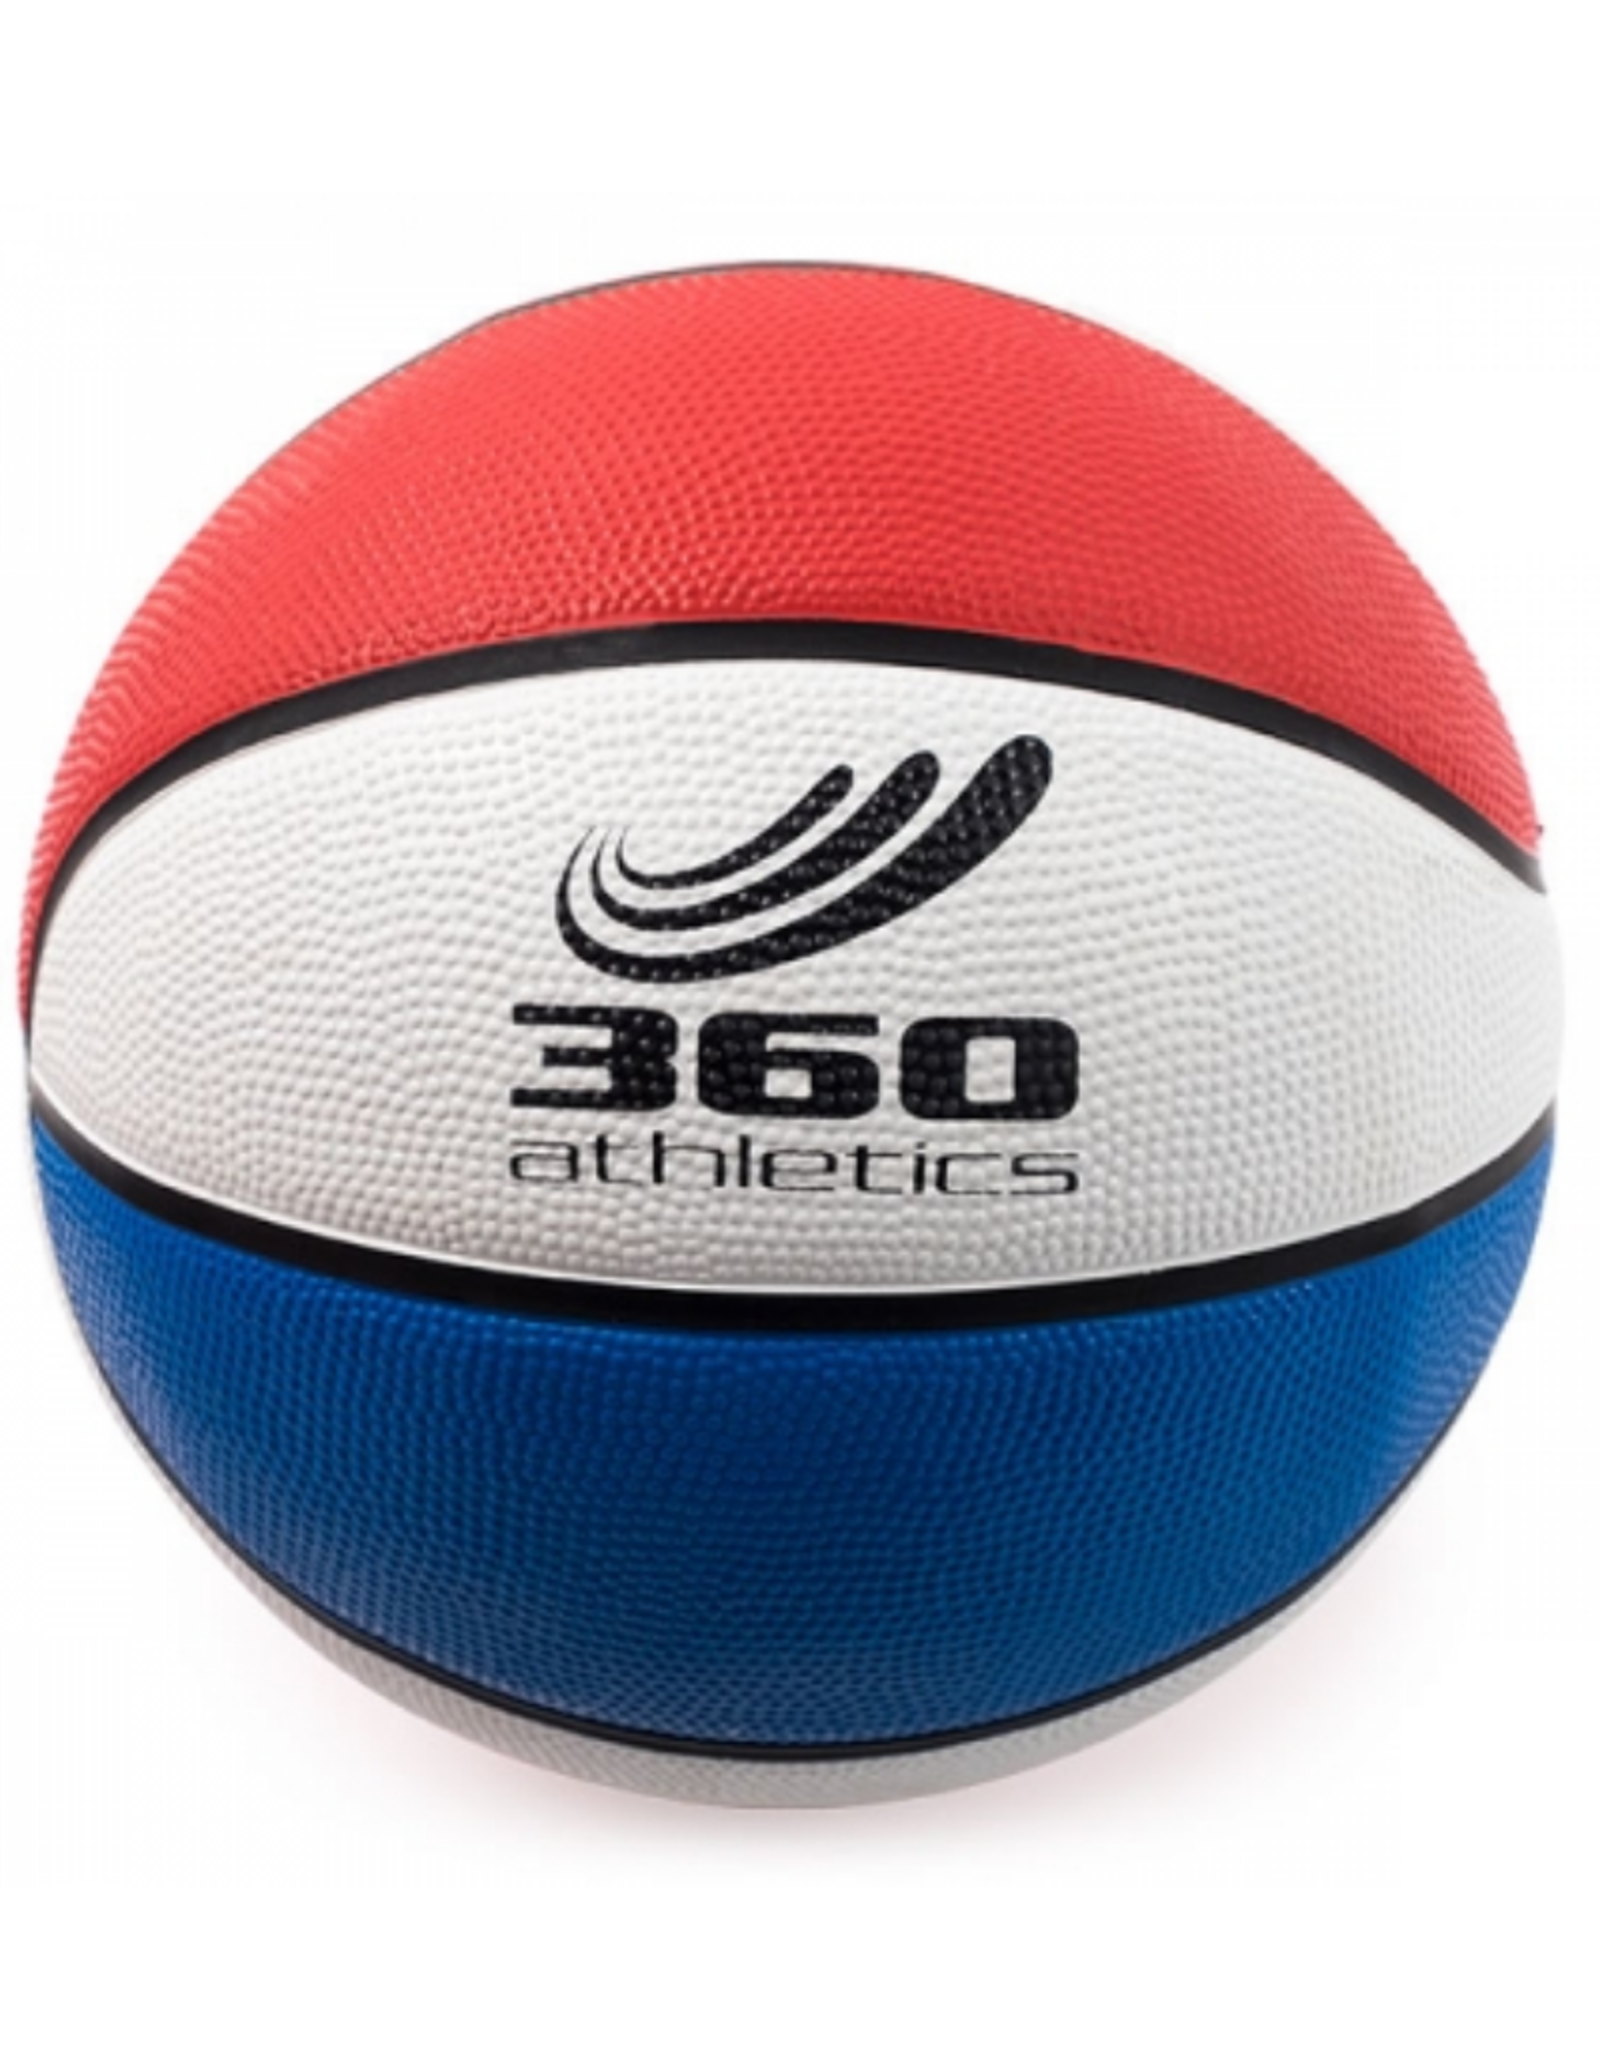 360 Athletic 360 Athletics Cellular Basketball Red White Blue Size 7